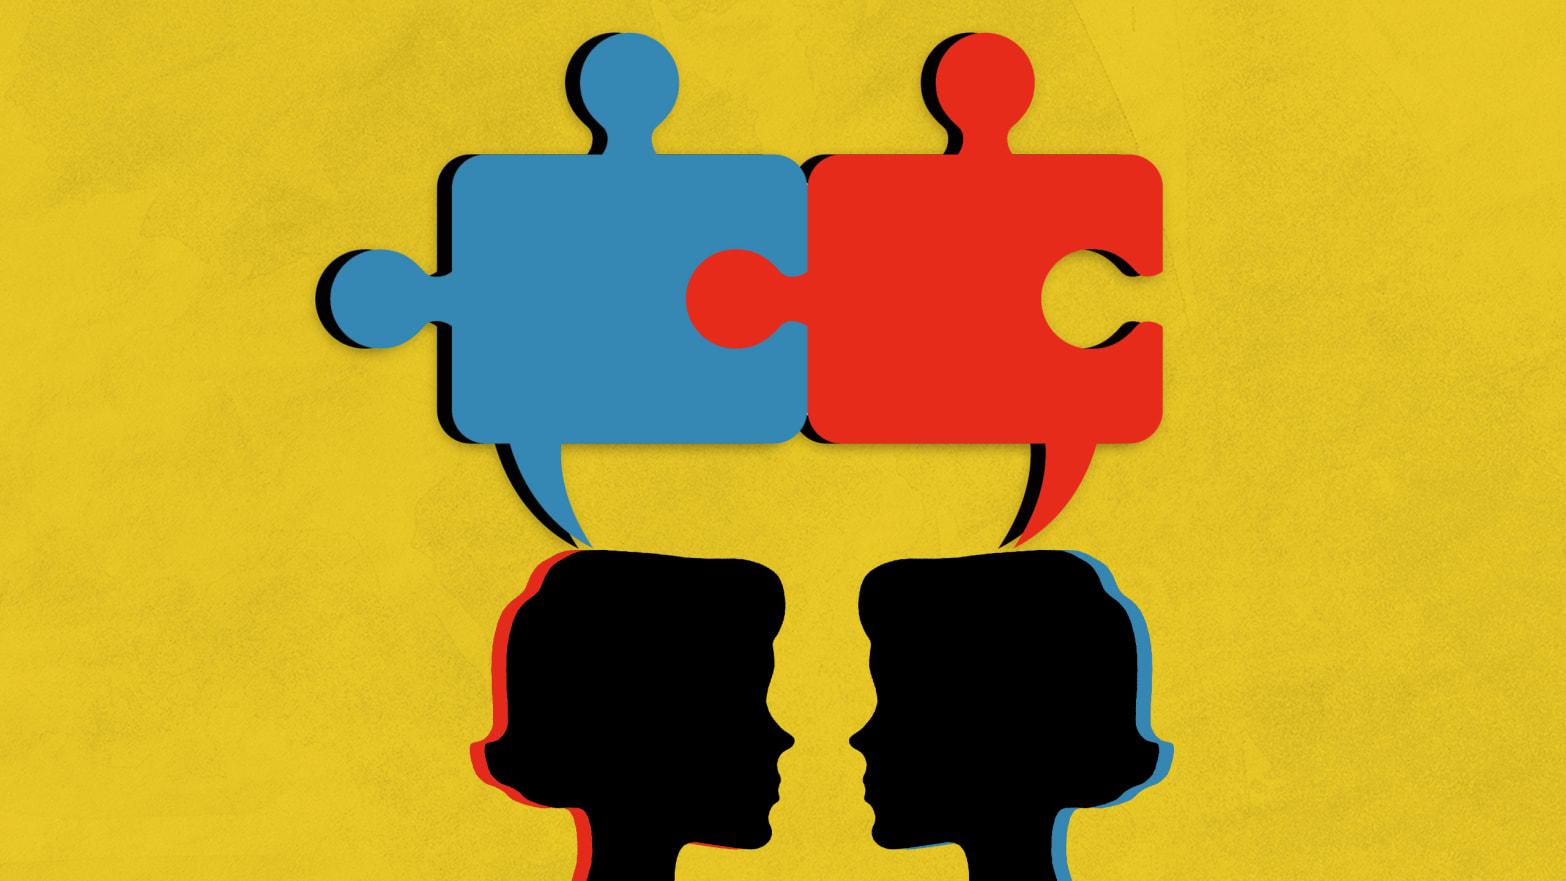 autism autistic yale university child study center roger jou federico bolognani mental illness vasopressin pill cure fda breakthrough therapy aviation study